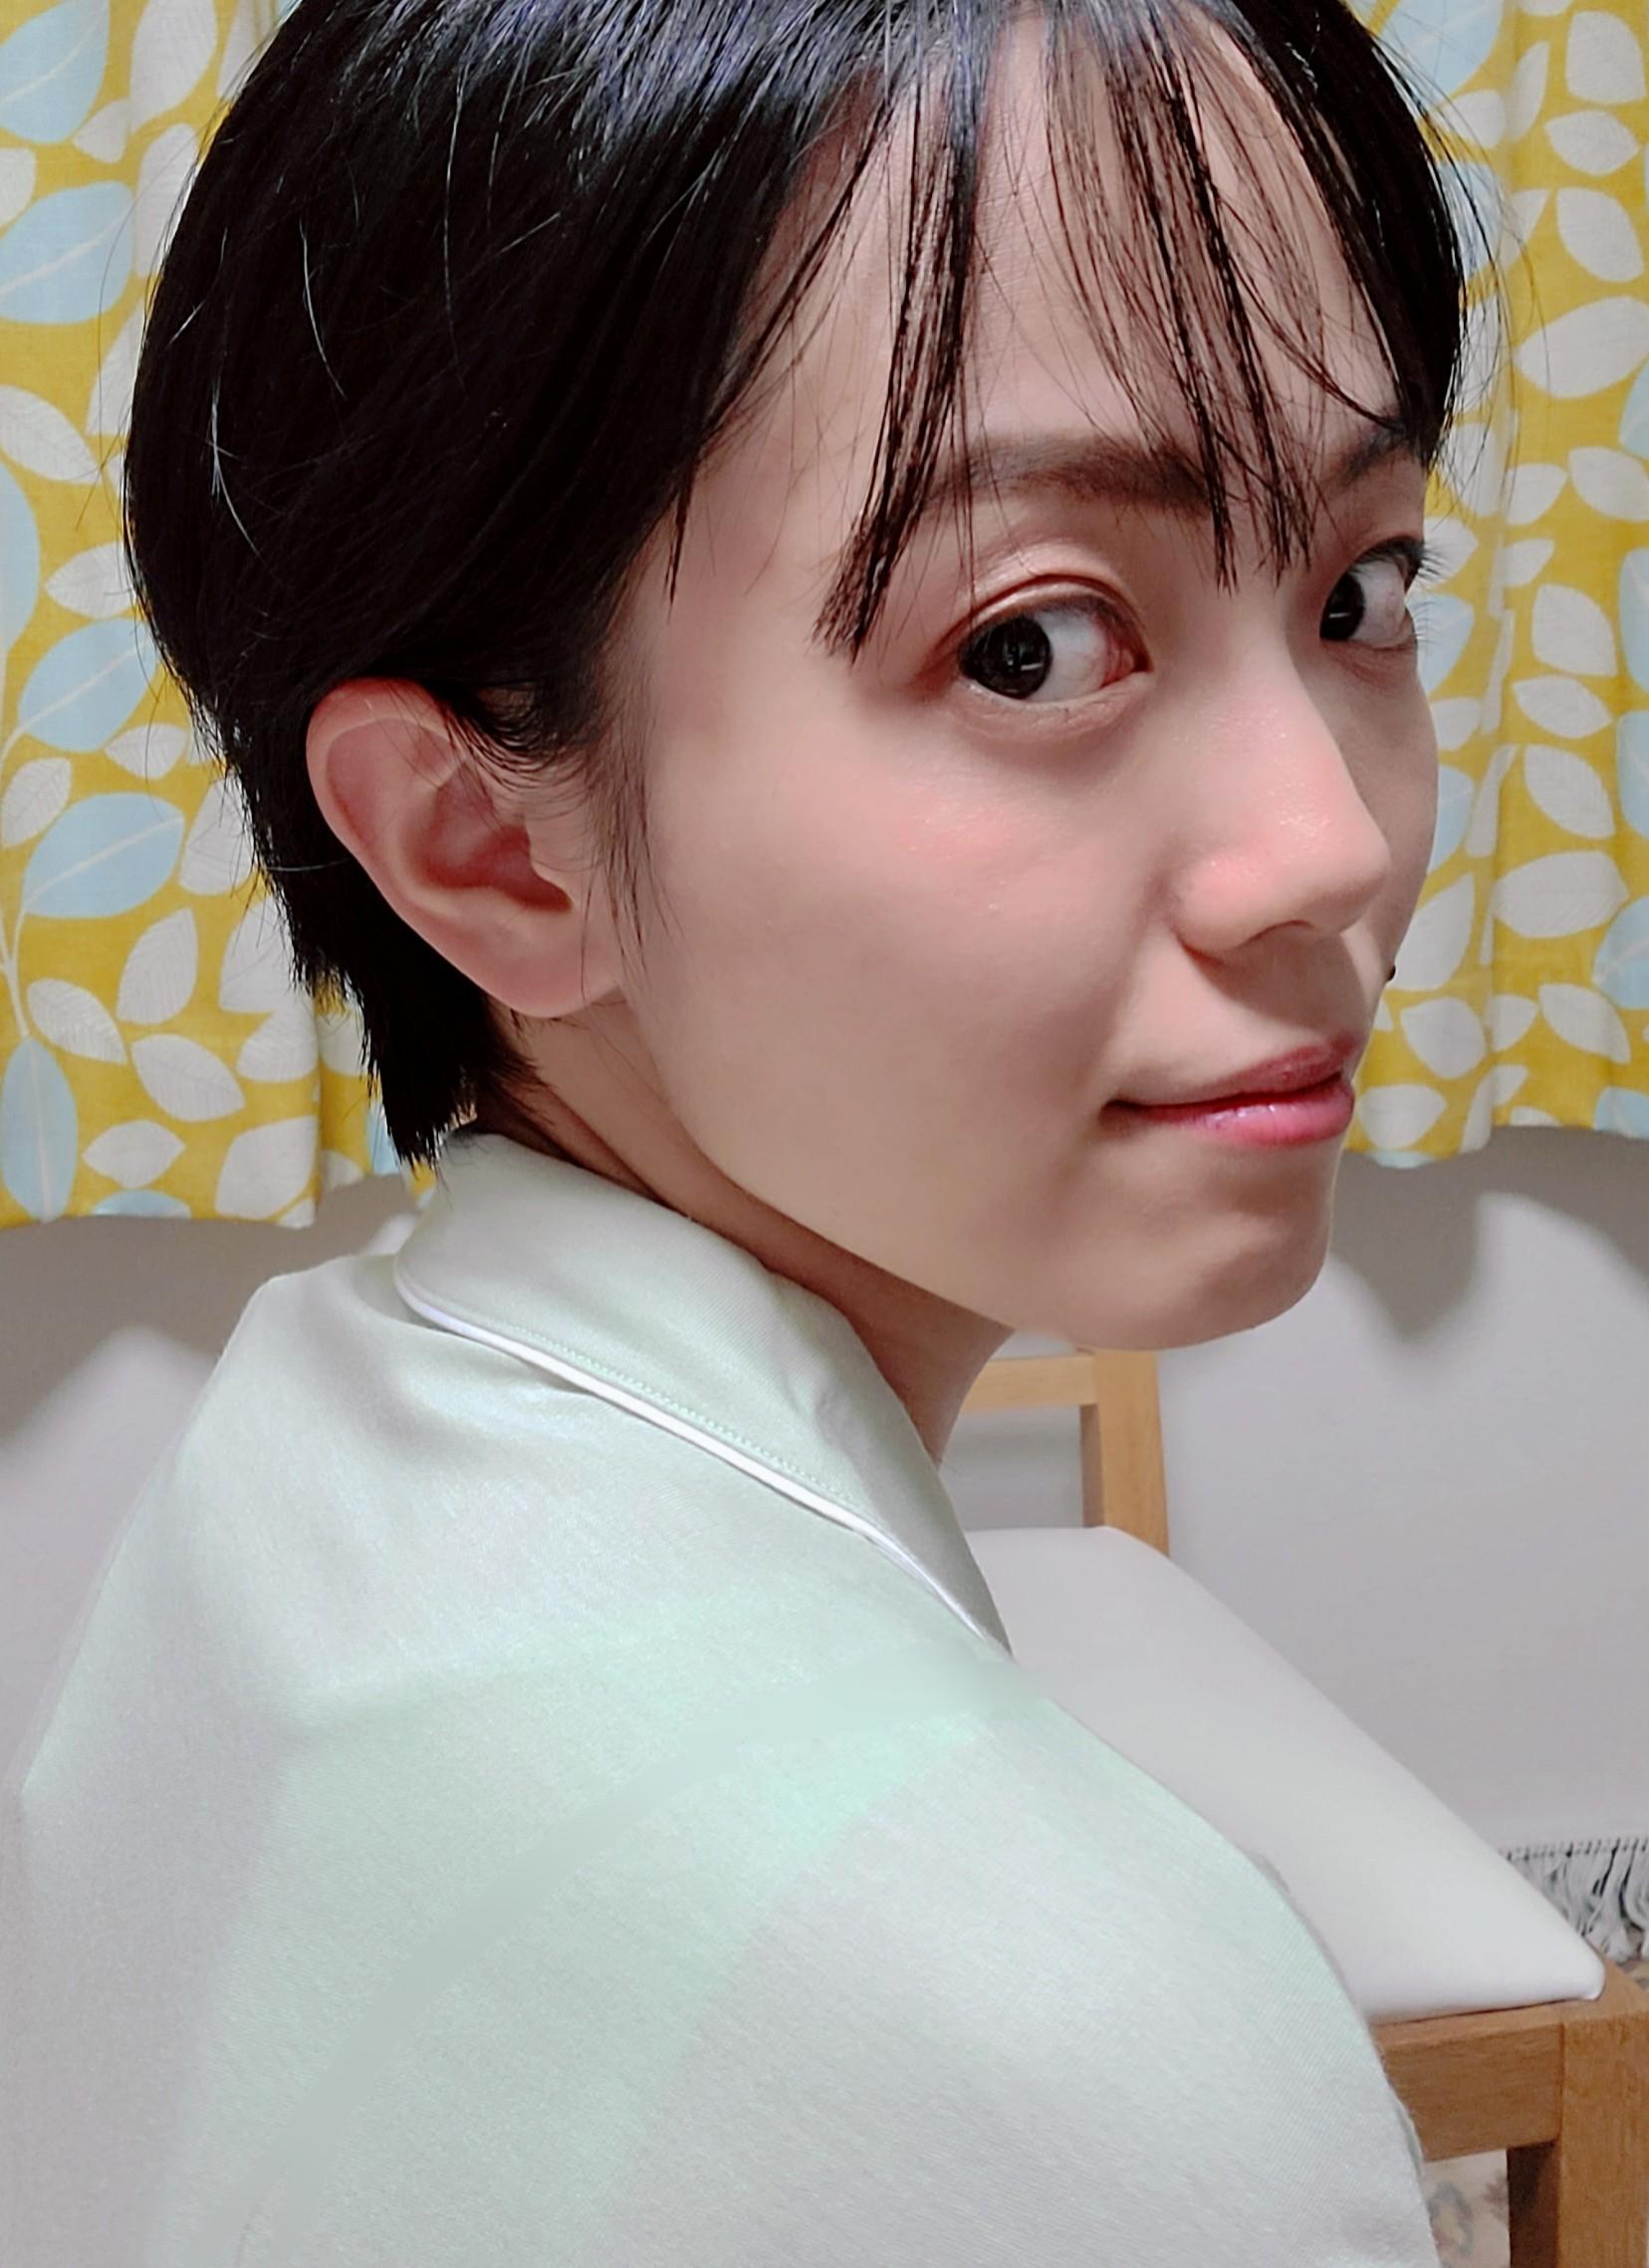 【GU×SABONコラボ第2弾】8/24発売!アロエパジャマがかわいいだけじゃない!しっとり質感でうっとり❤️_7